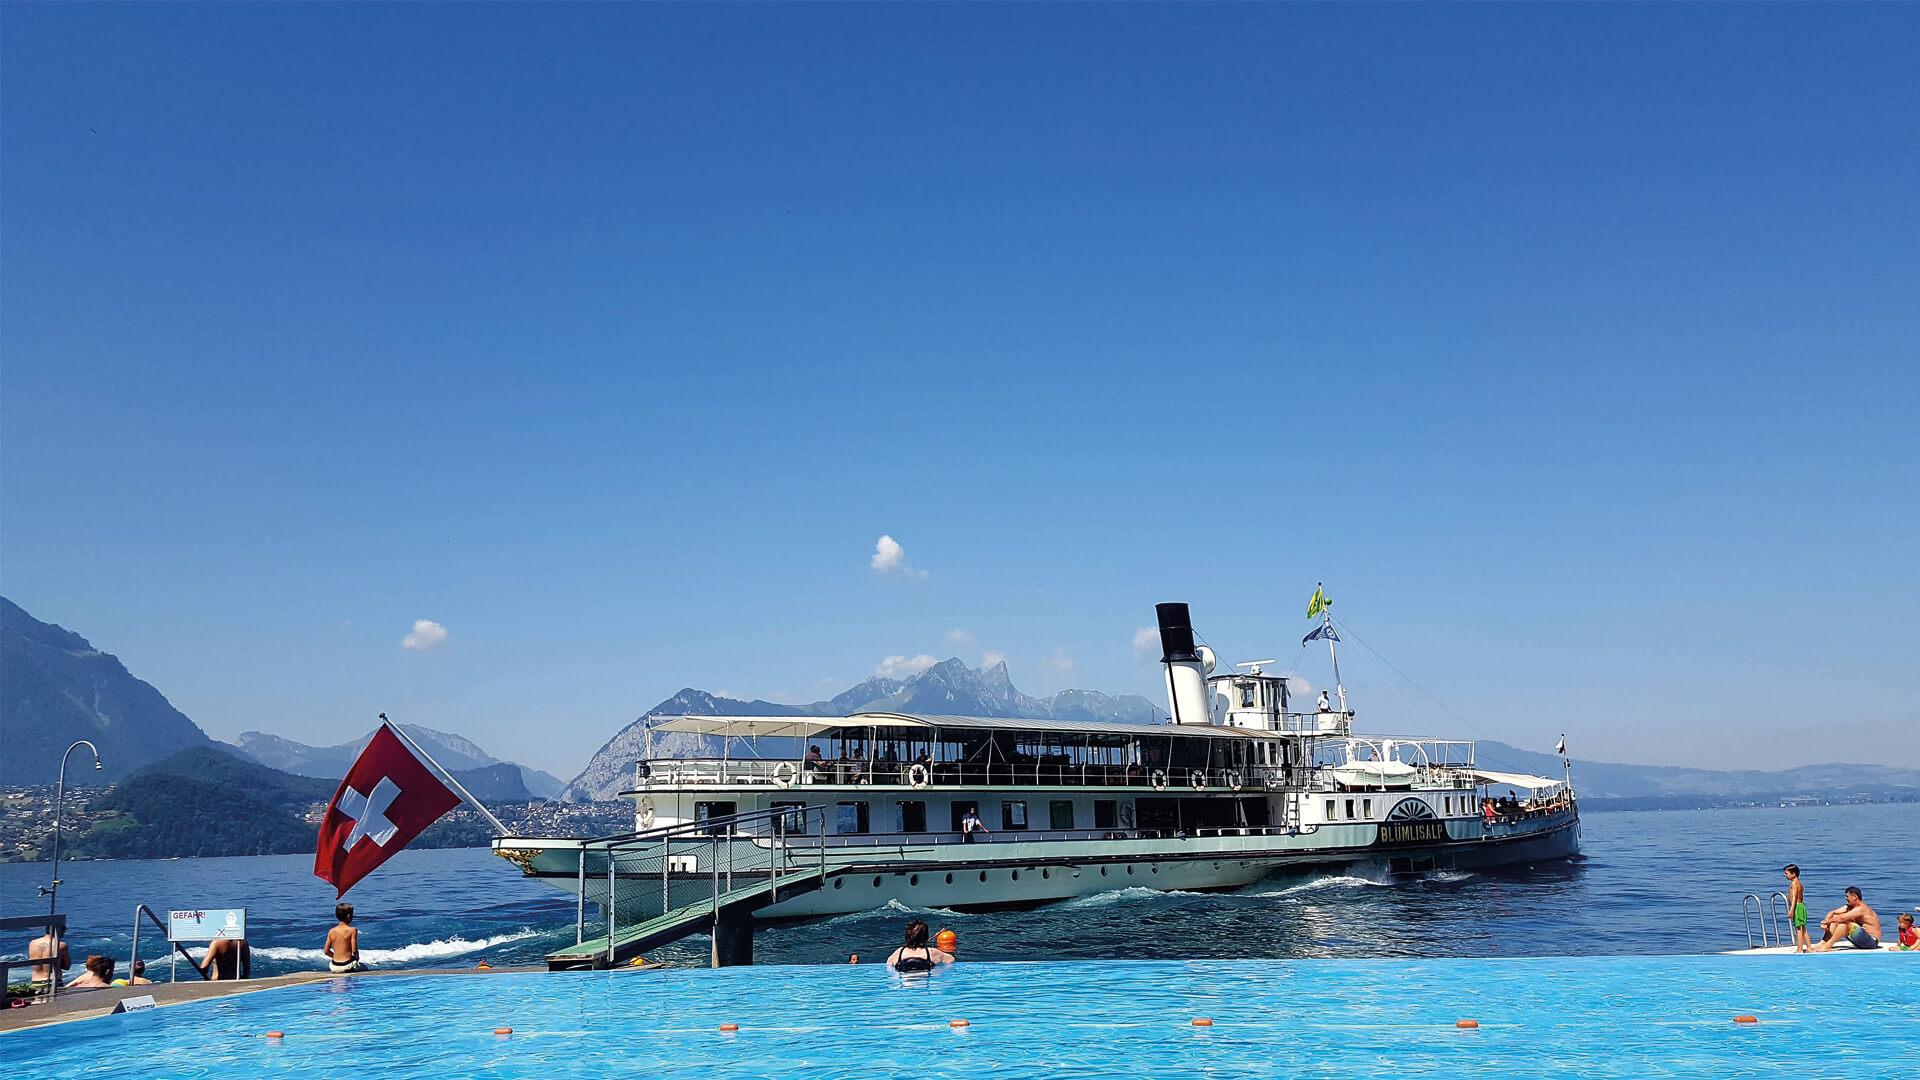 merligen-strandbad-sommer-pool-thunersee-kursschiff